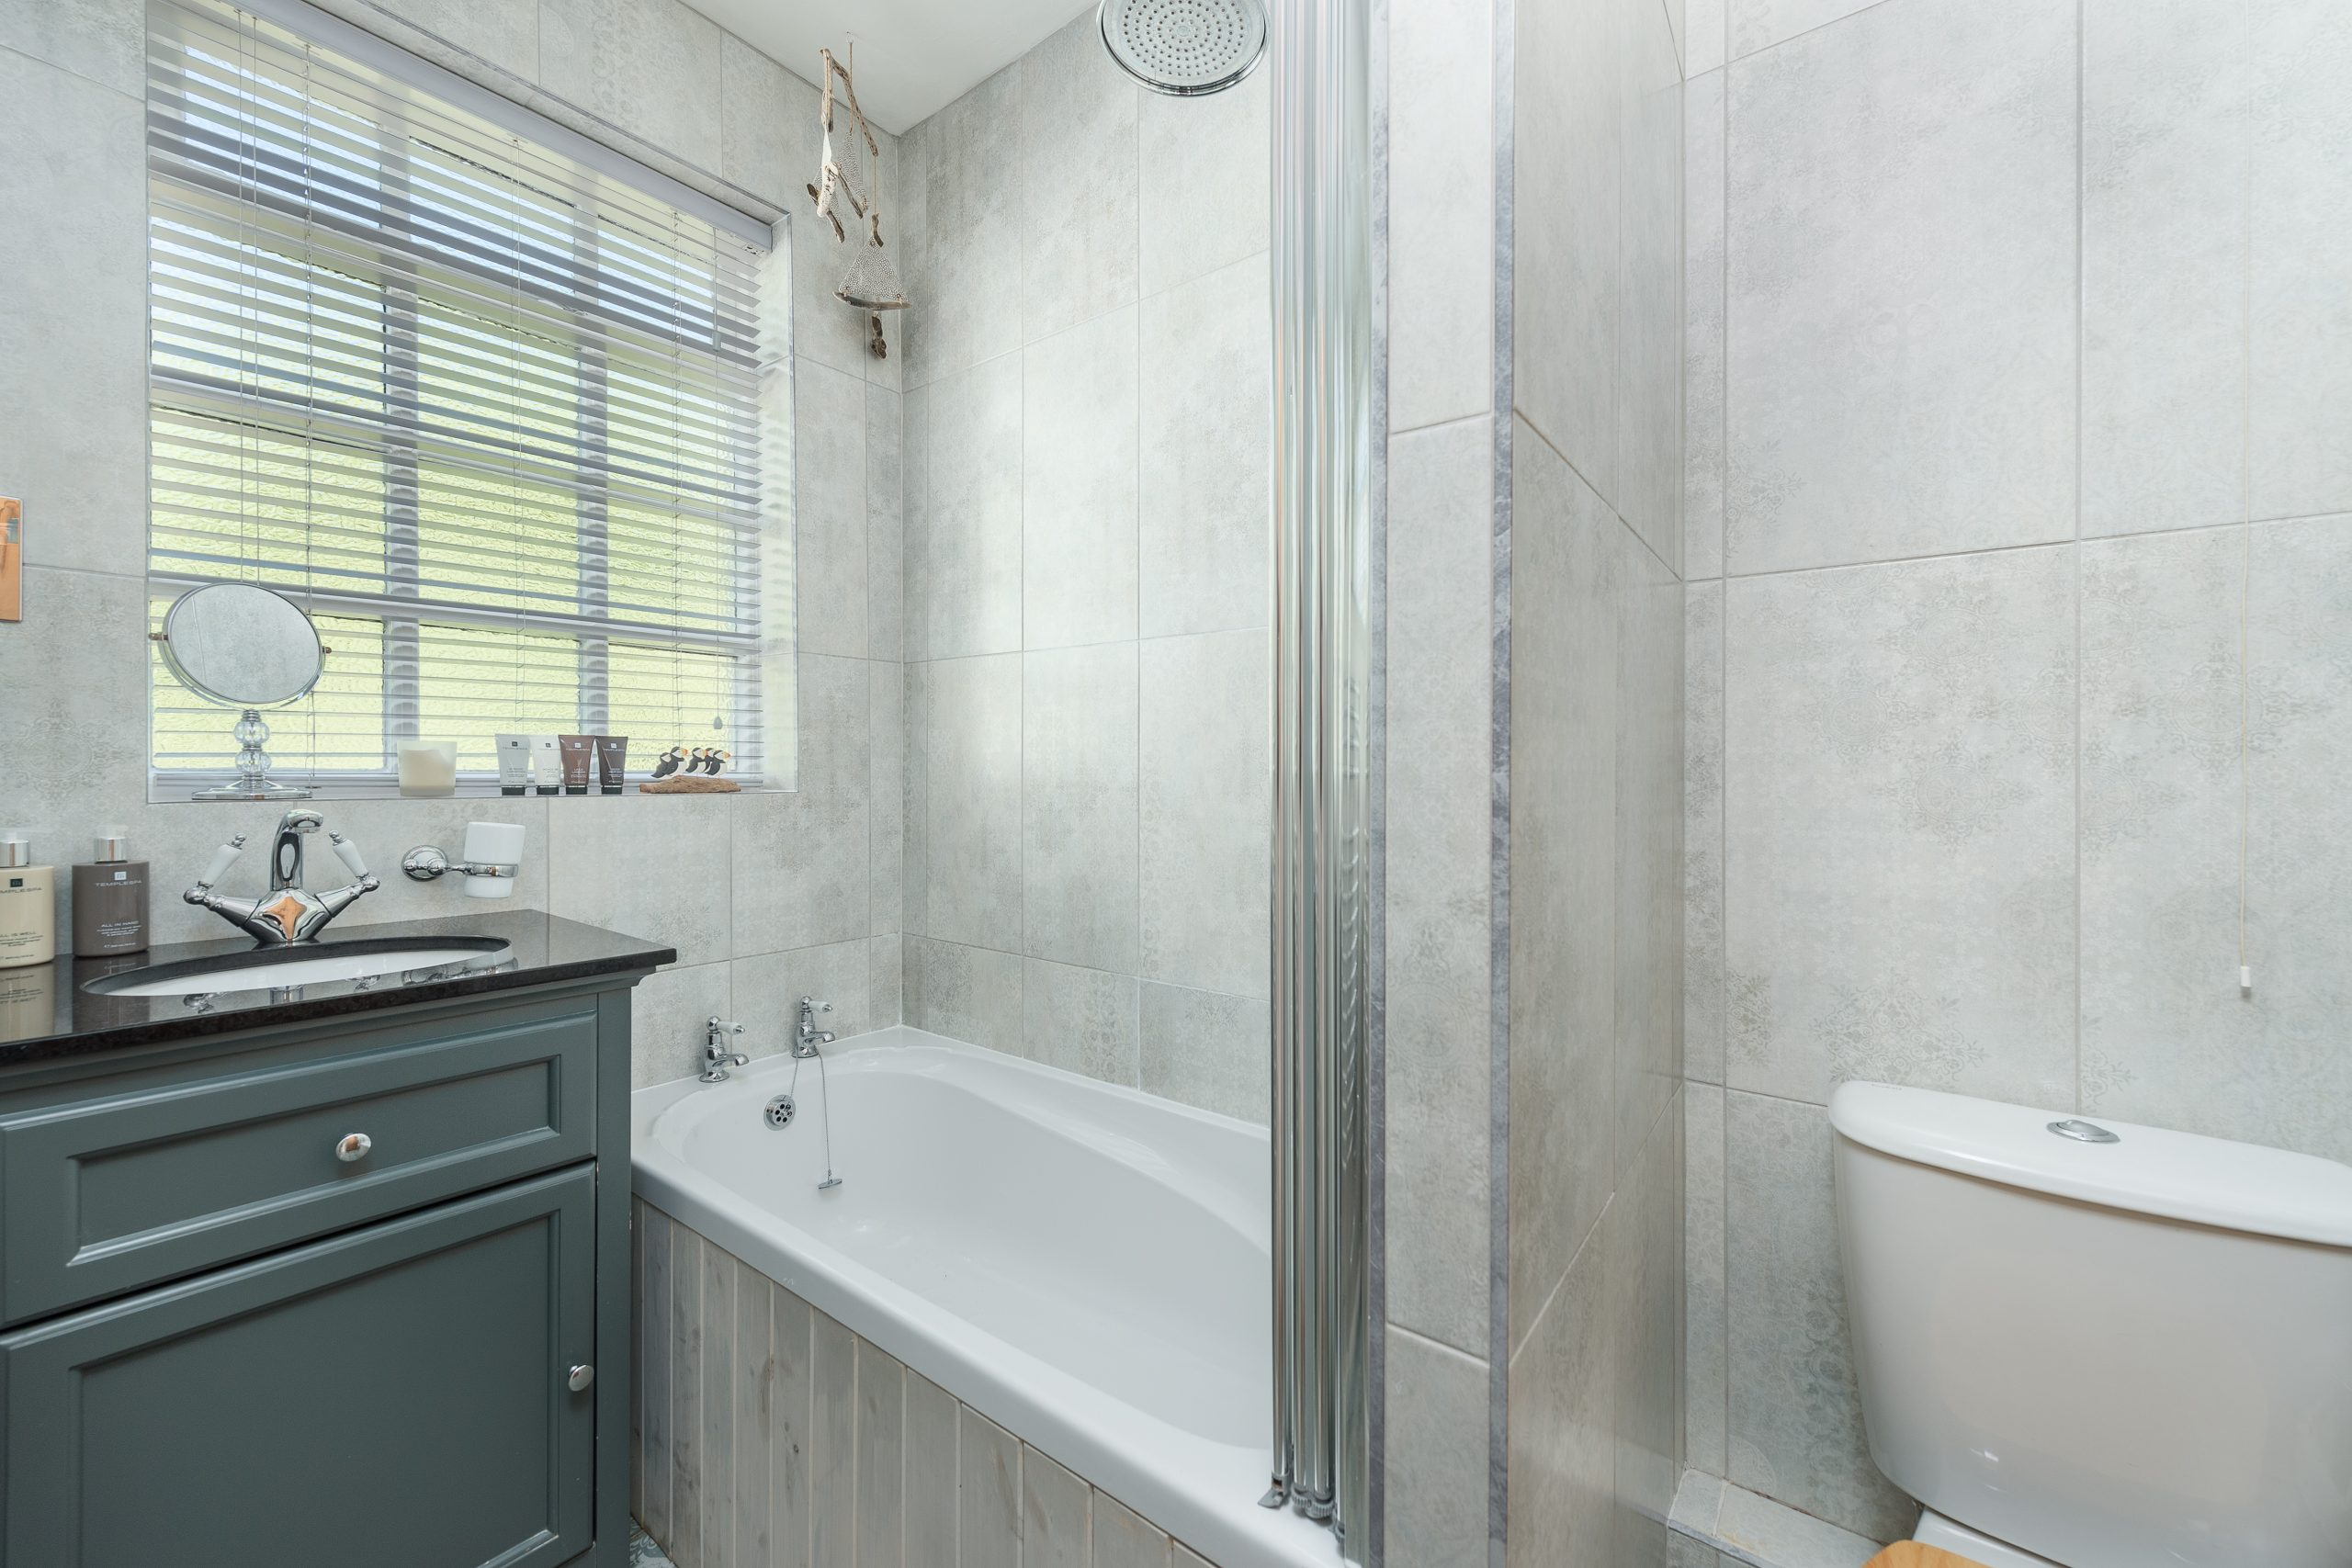 Tower Cottage bathroom in Warkworth village Northumberland